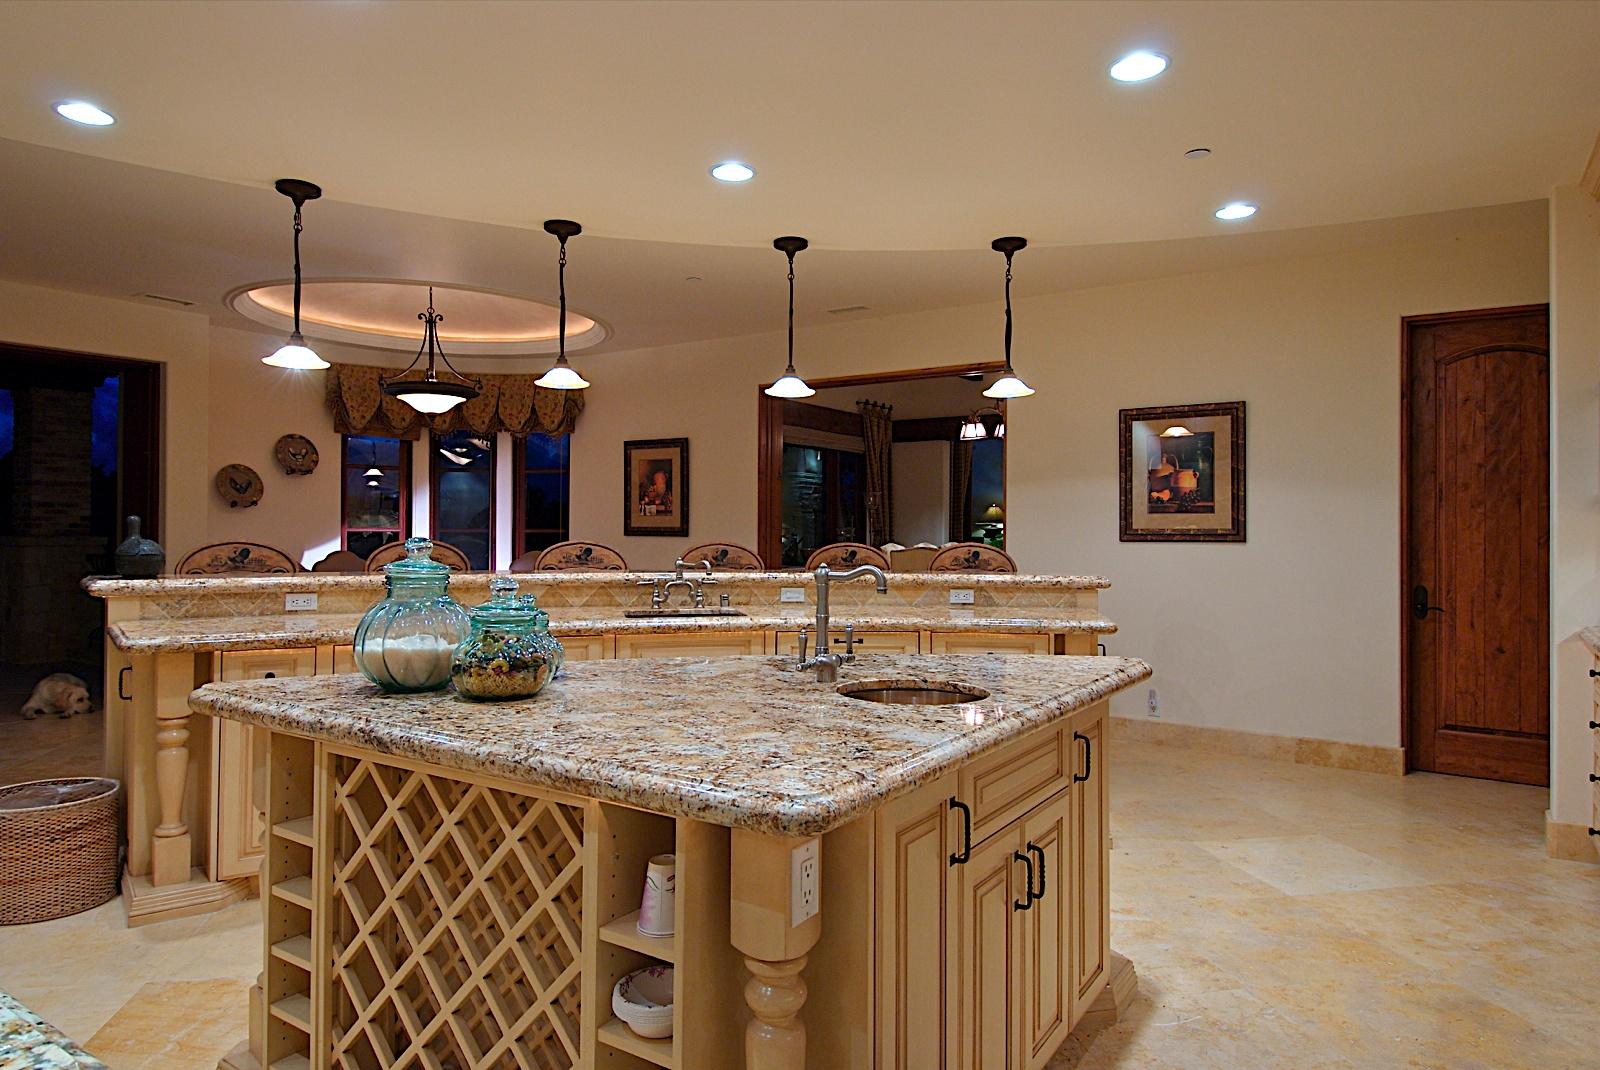 15 brilliant ideas for proper kitchen lighting kitchen light